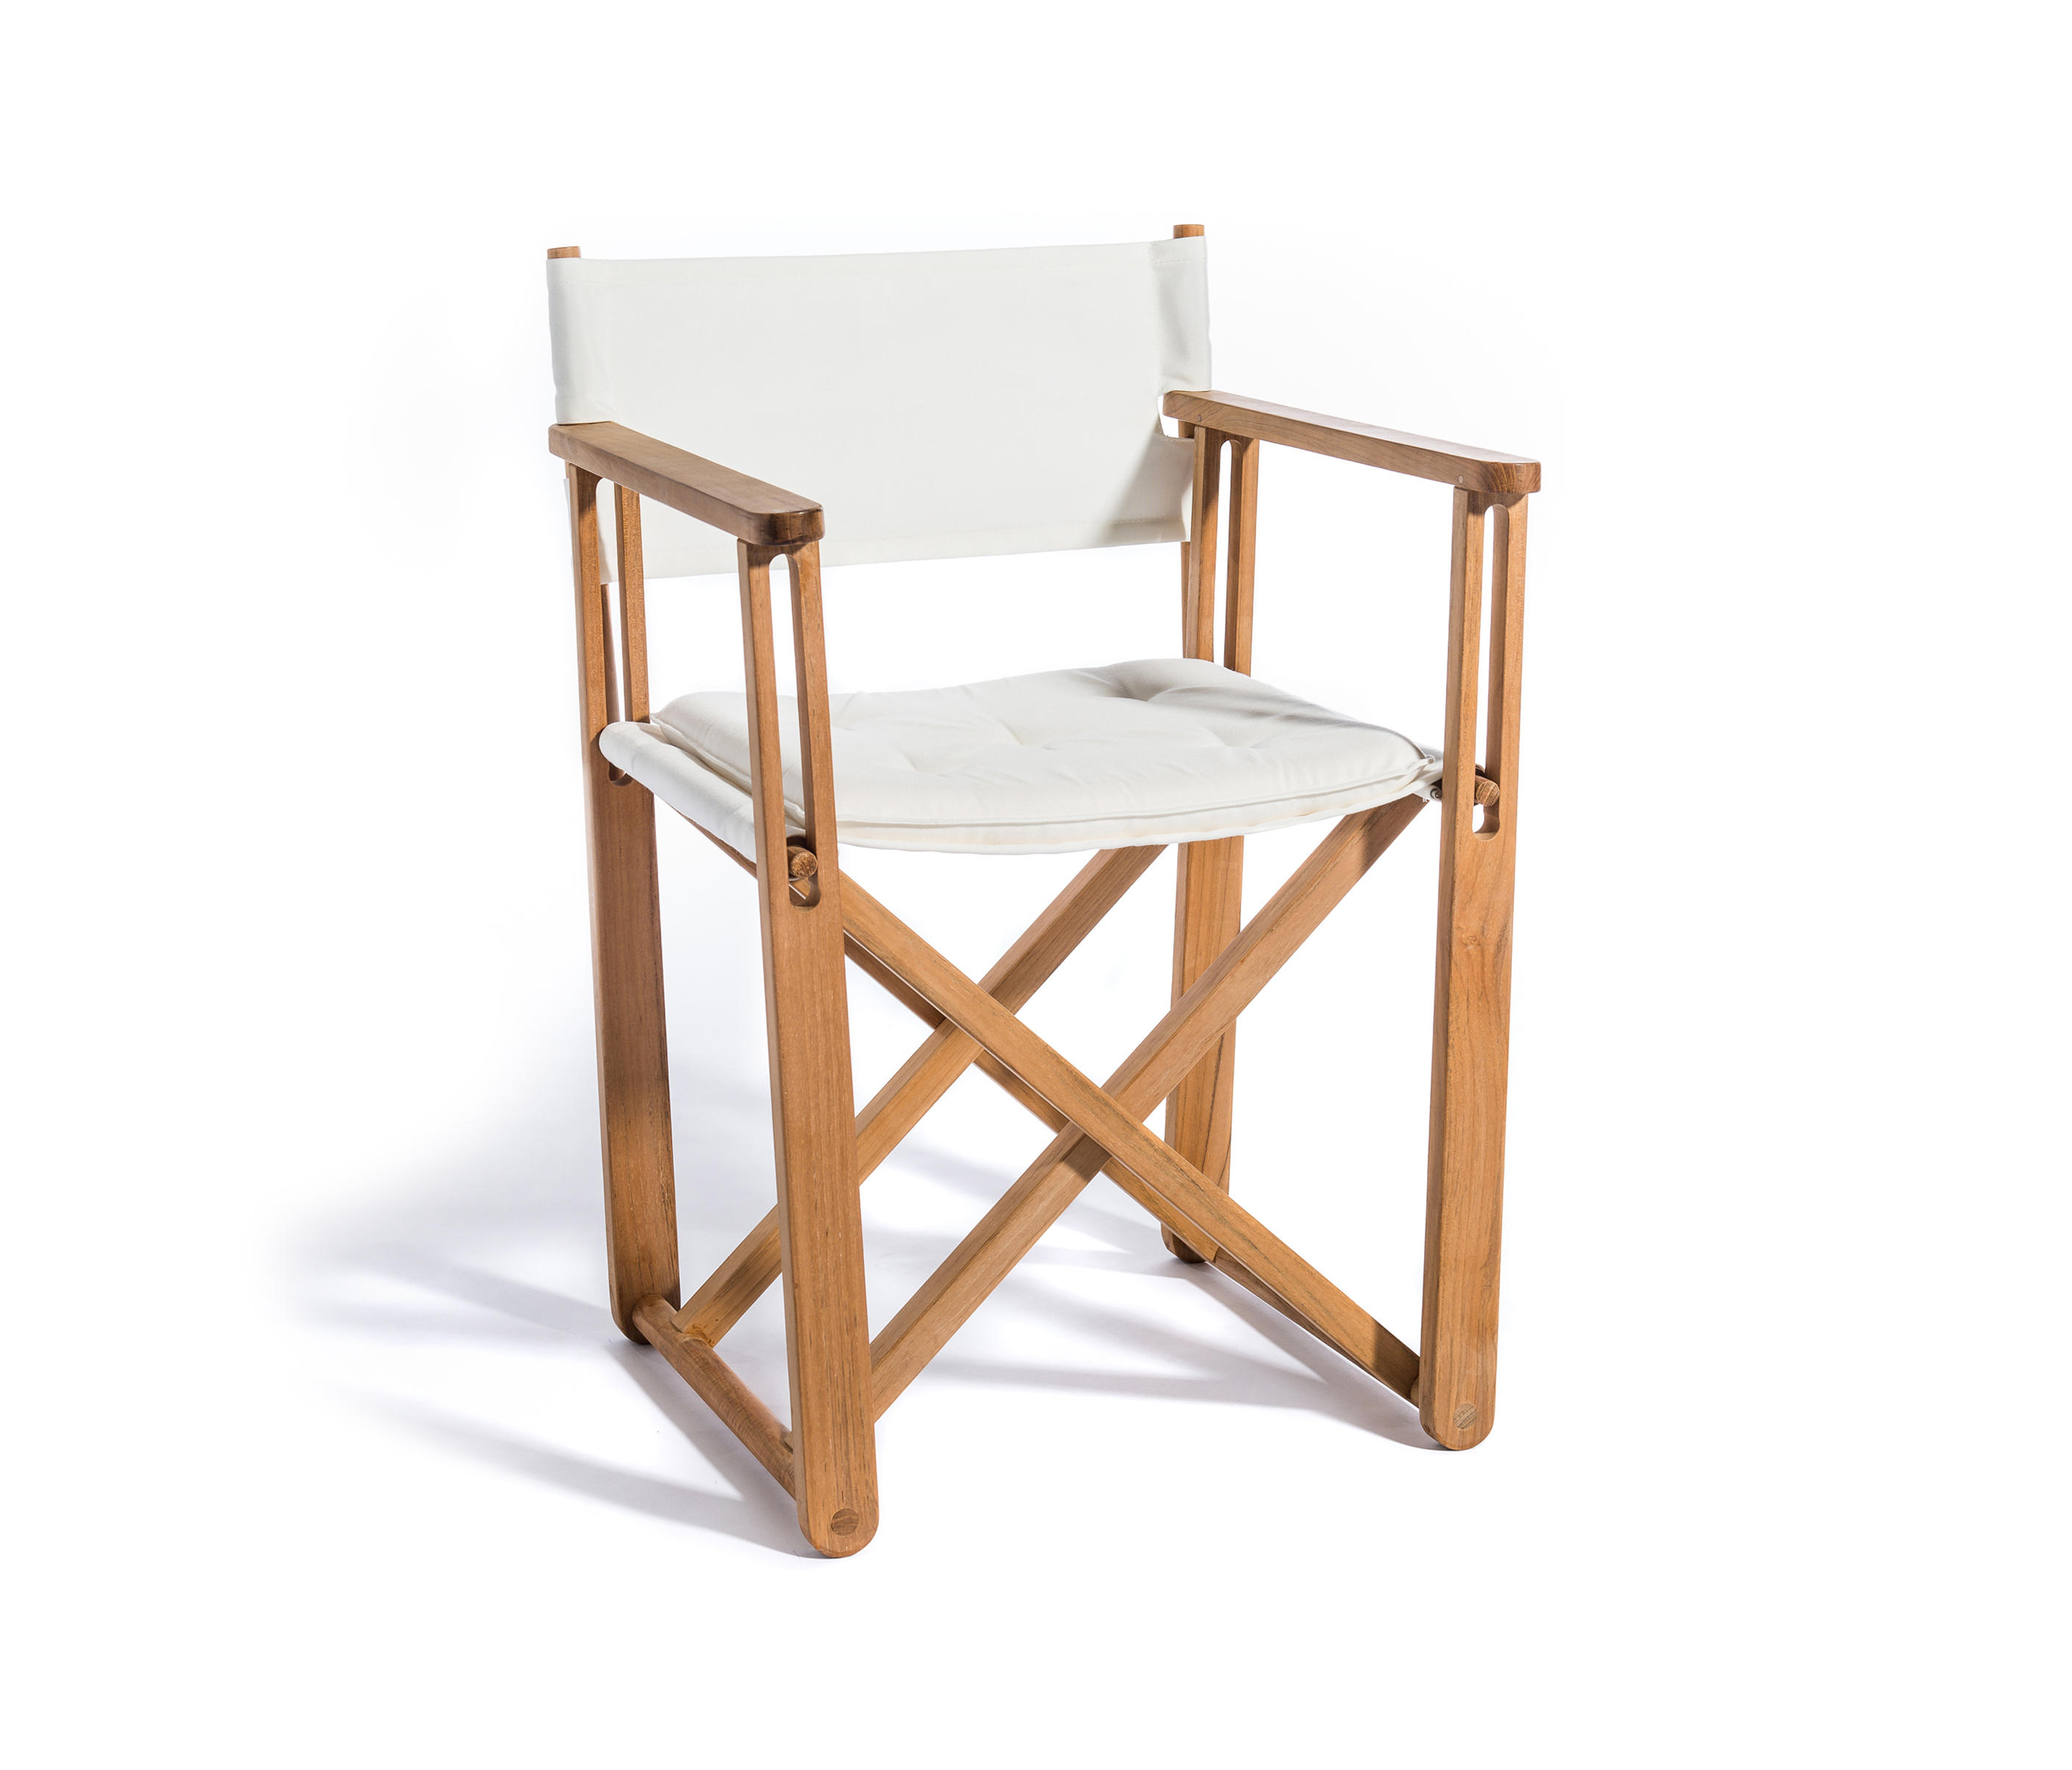 Kryss dining chair by skargaarden chairs